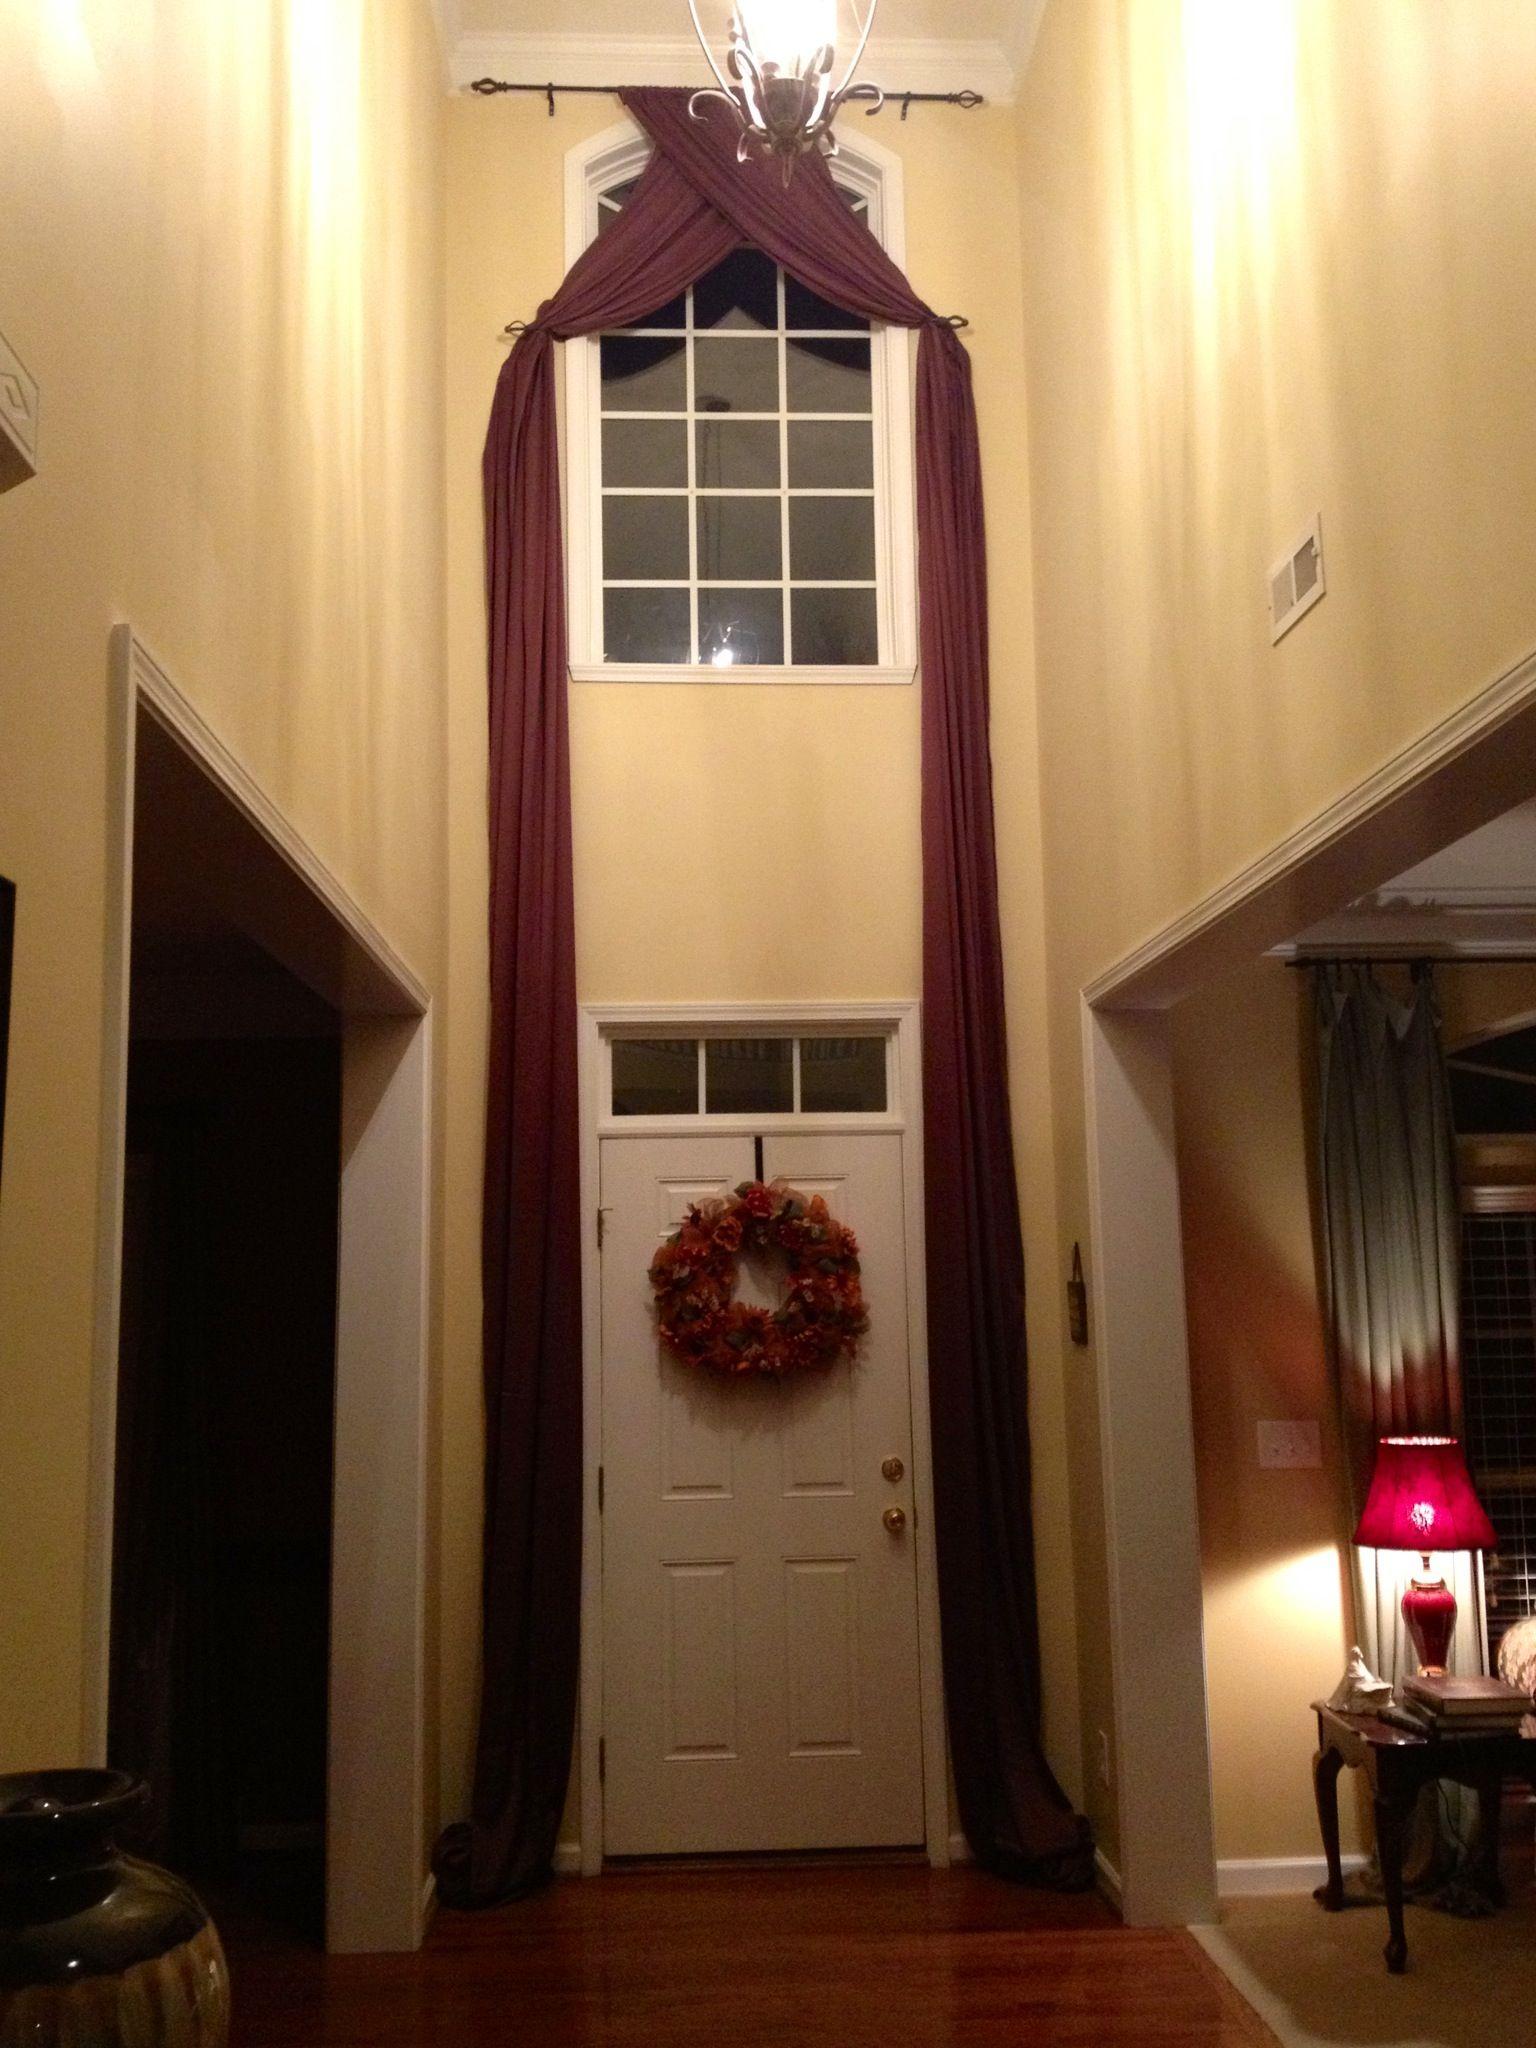 Two Story Foyer Drapes | Decorating ideas | Pinterest ...